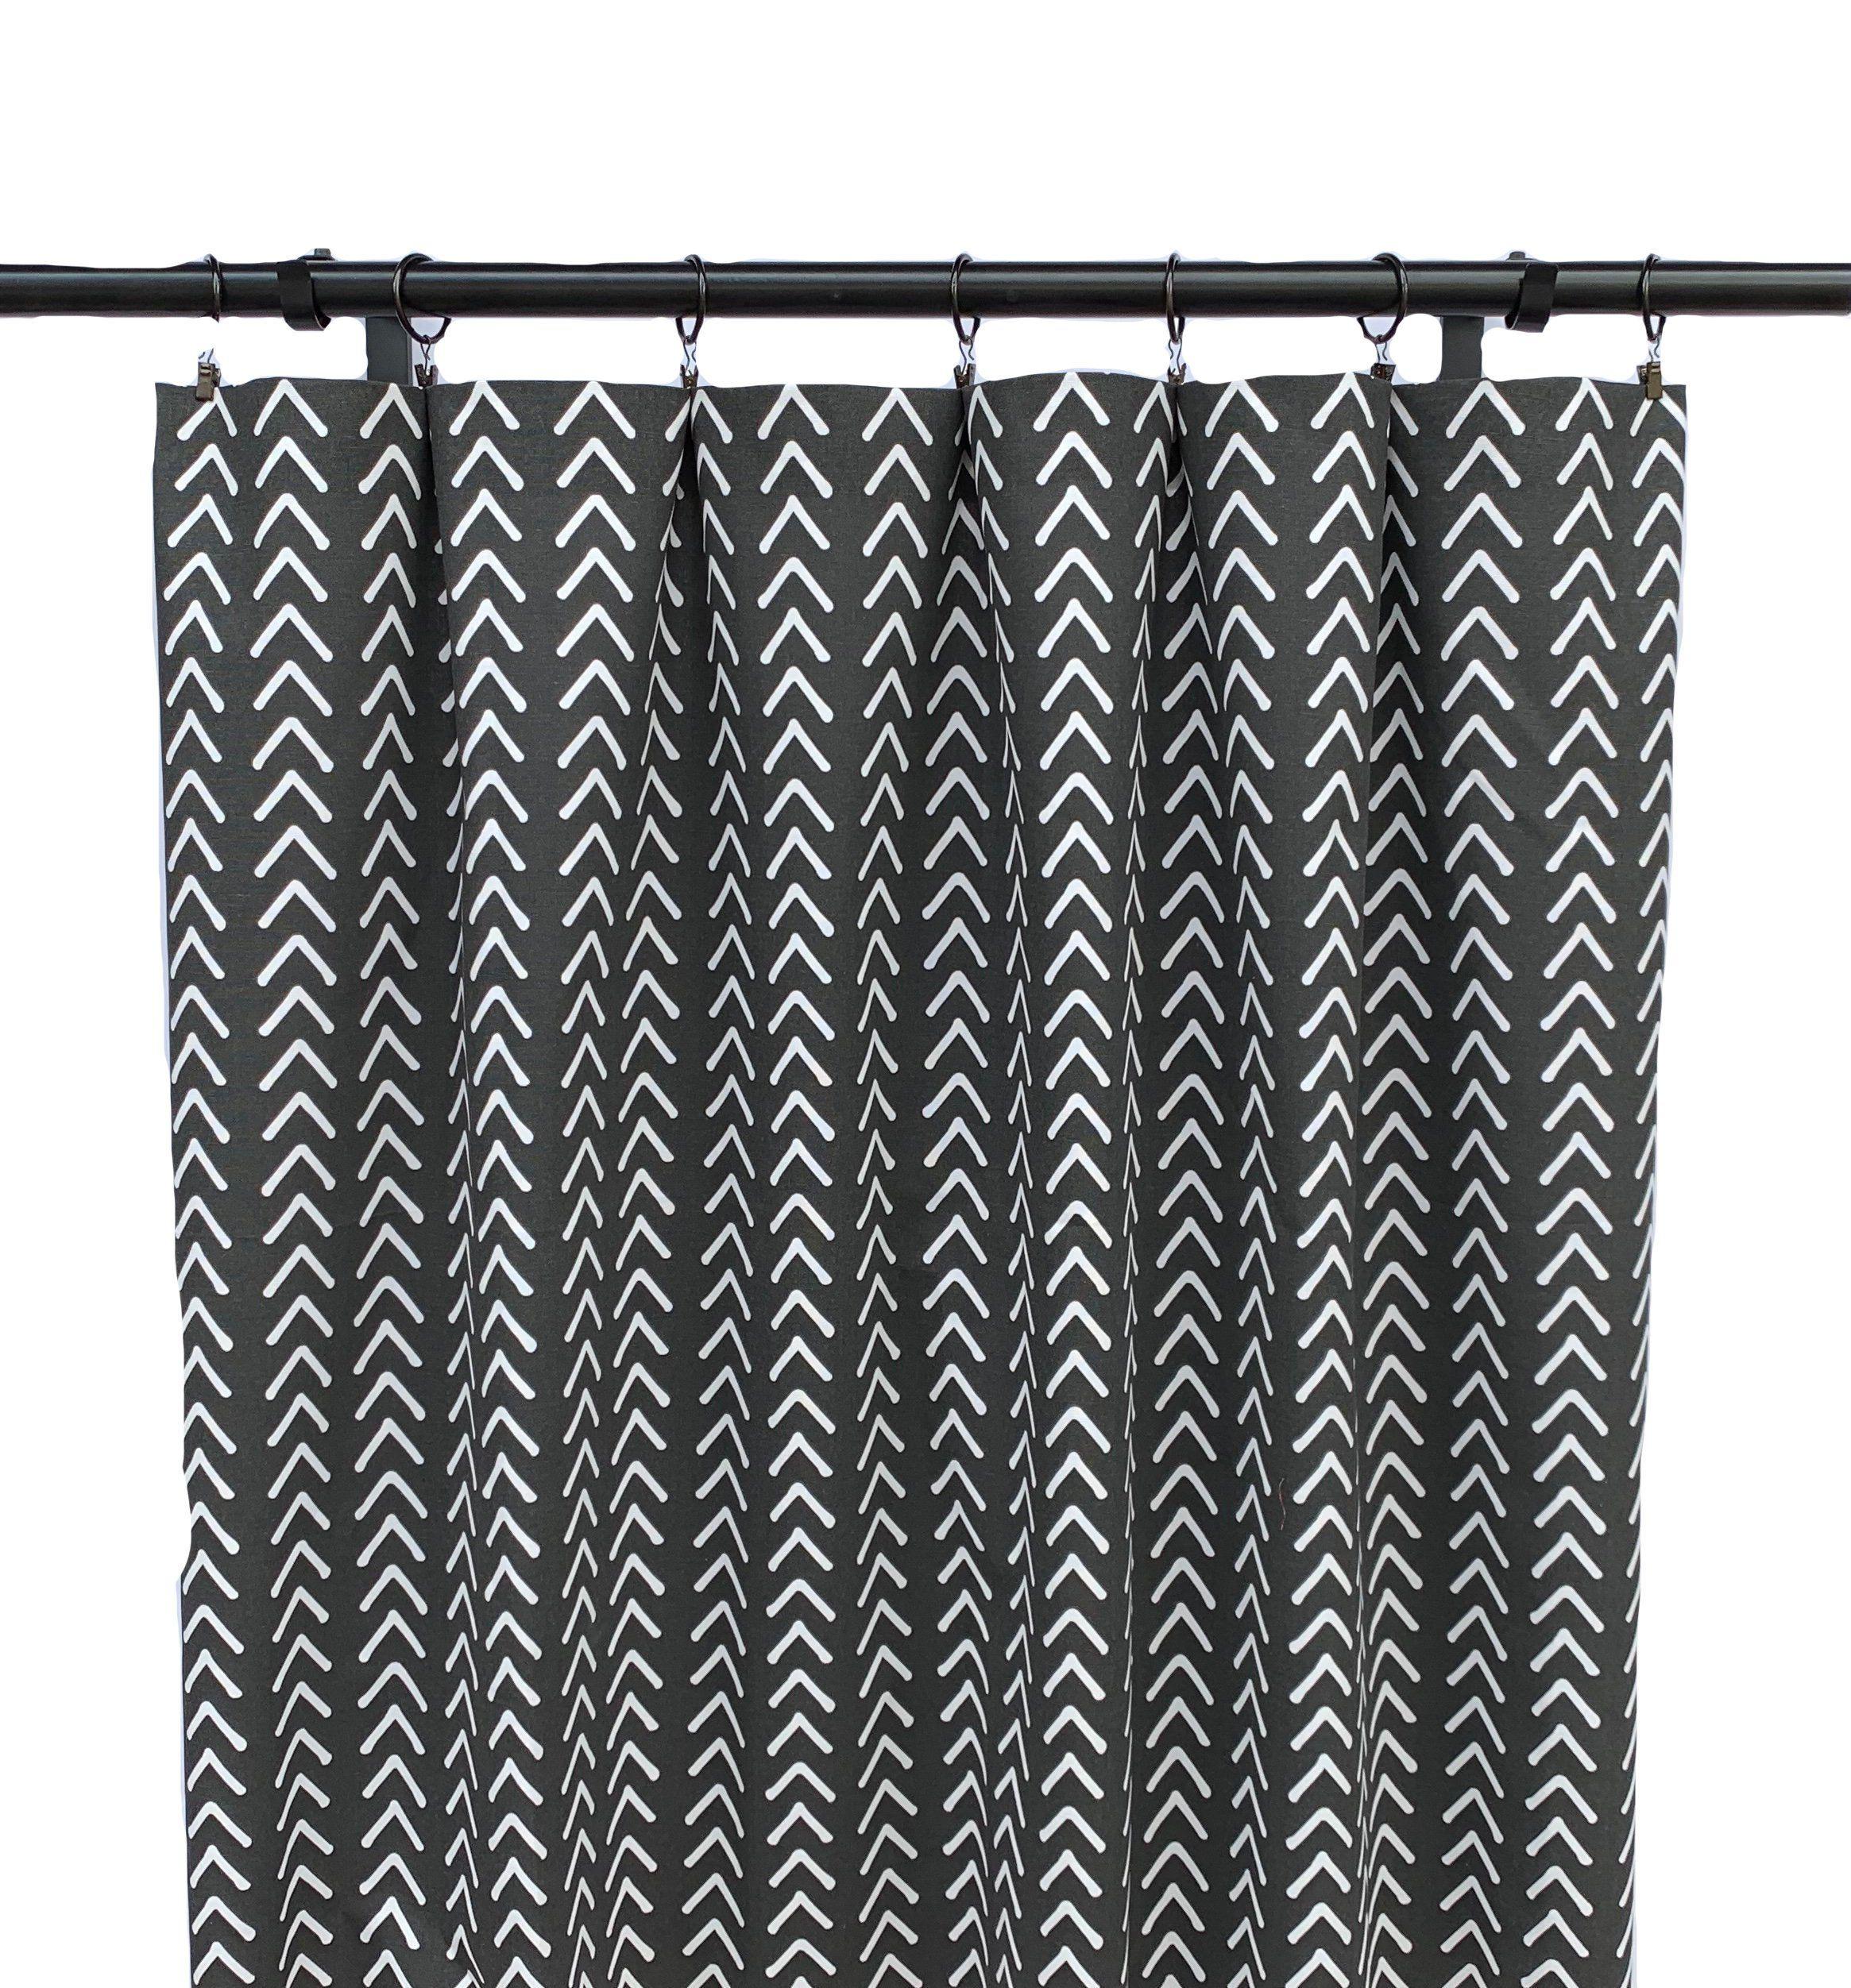 Black And White Boho Curtains Black Striped Curtain 2 Etsy Geometric Curtains Boho Curtains Striped Curtains